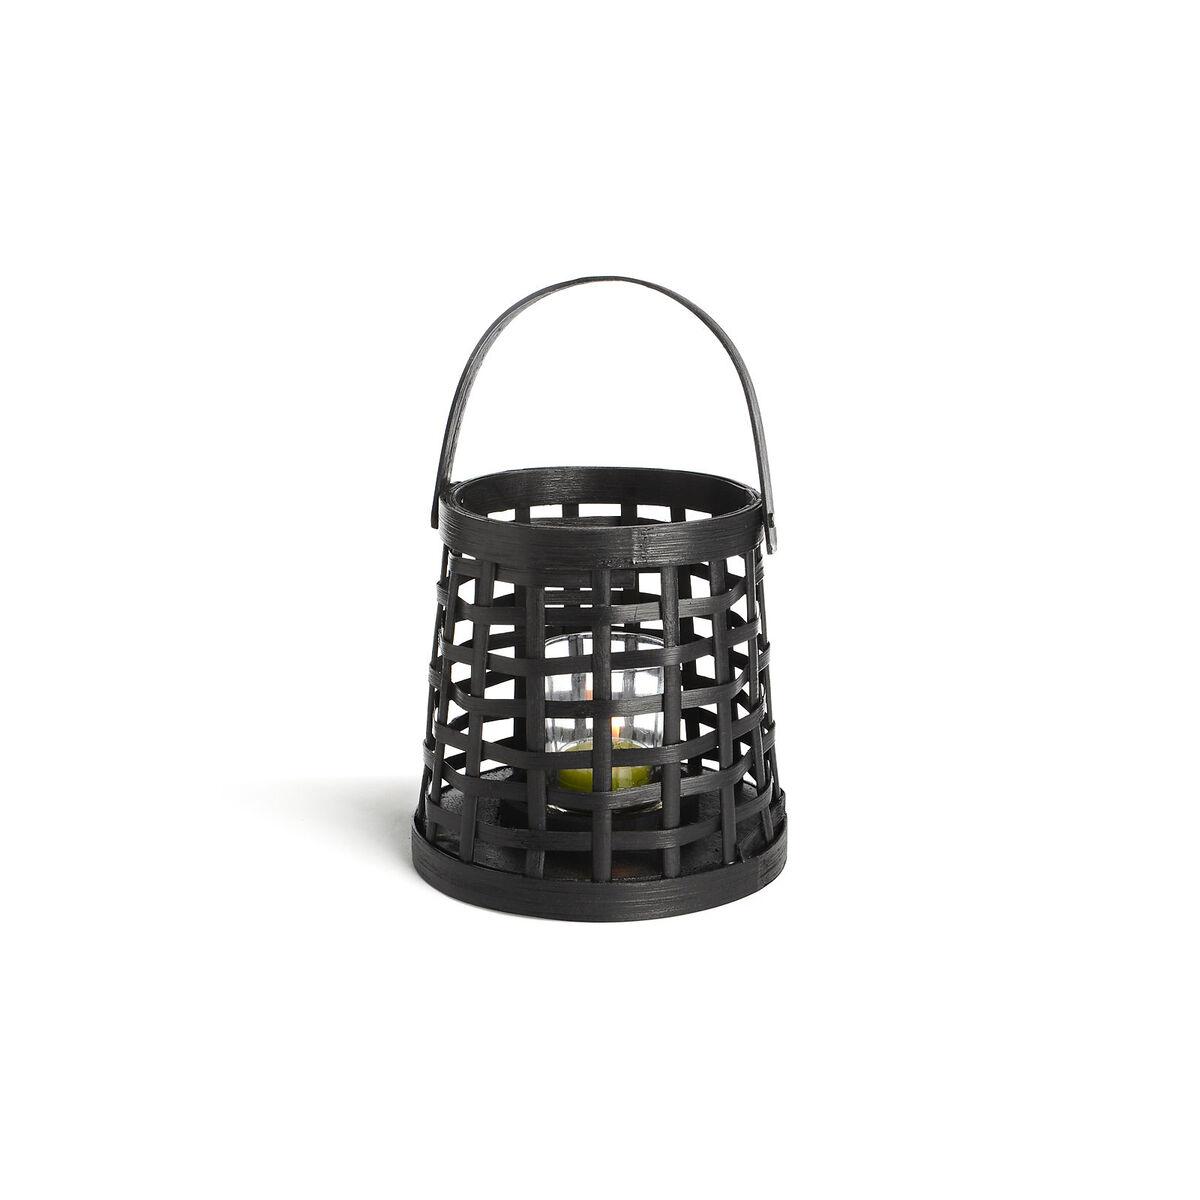 windlicht bambus schwarz ca d 12 x h 14 5 cm depot de. Black Bedroom Furniture Sets. Home Design Ideas